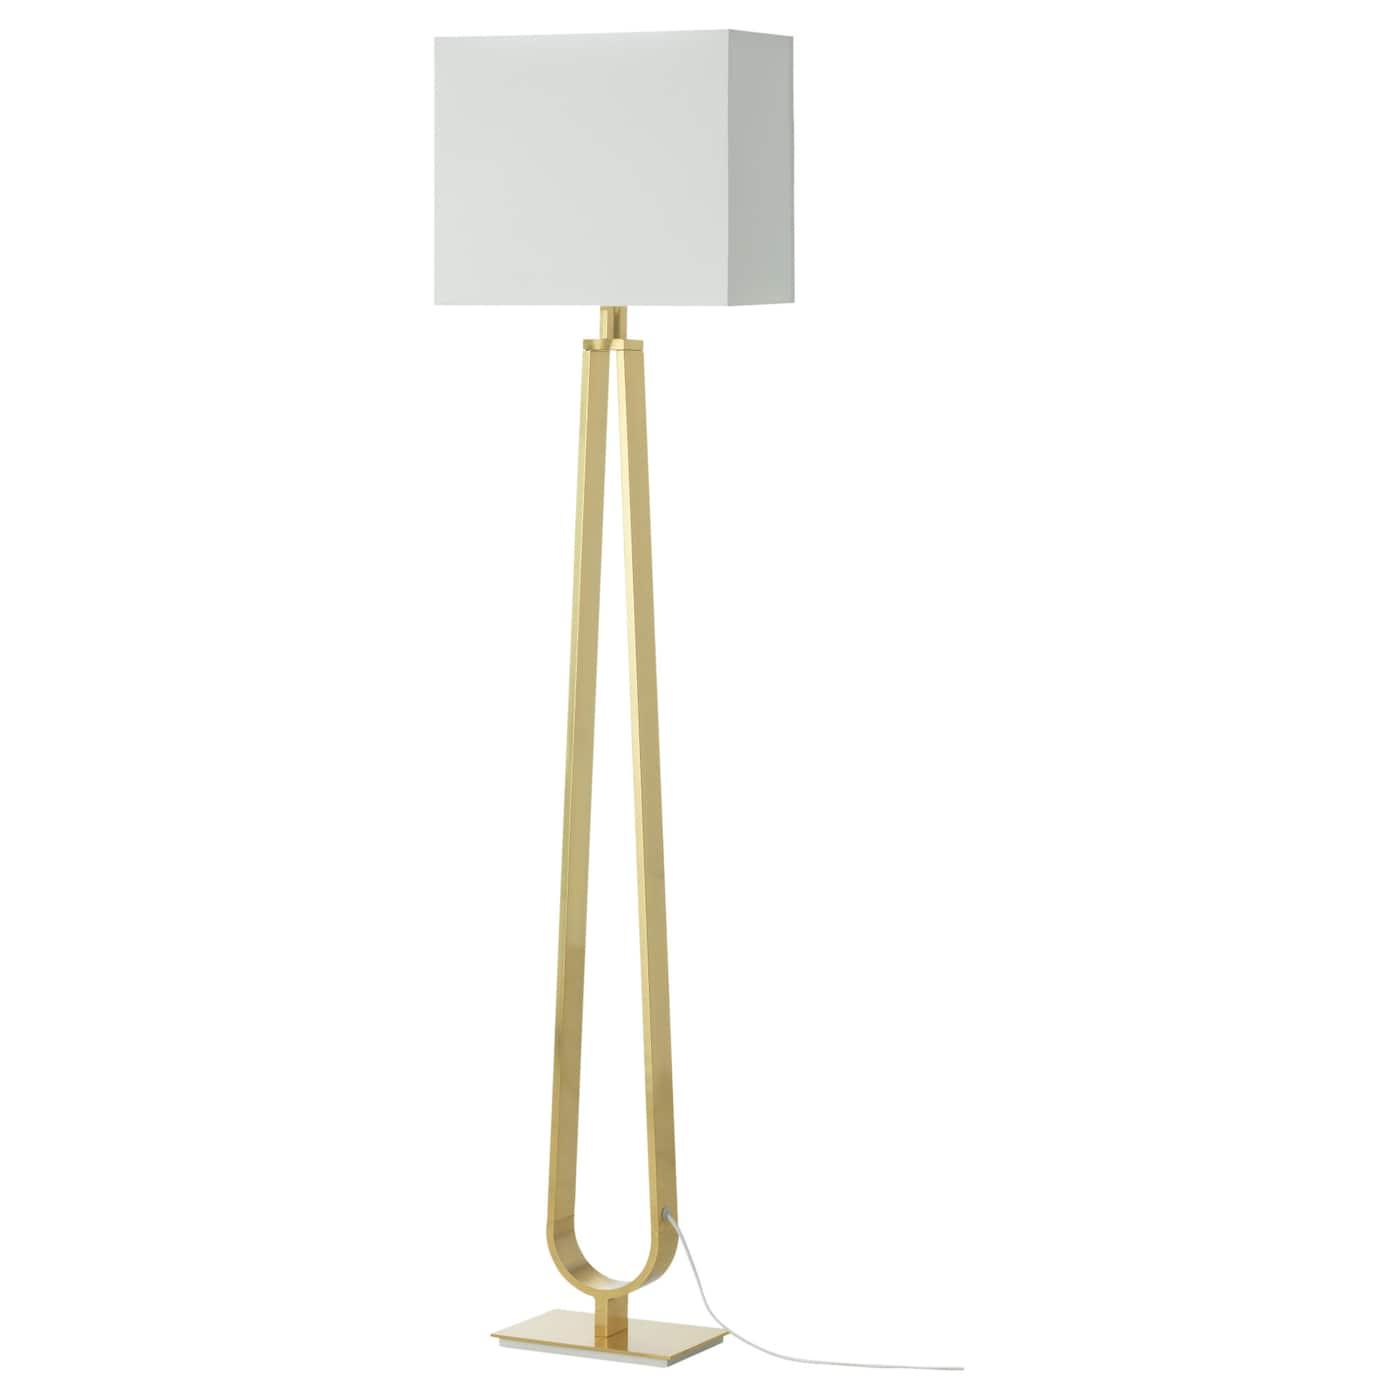 KLABB Floor lamp Offwhitebrasscolour 150 cm IKEA